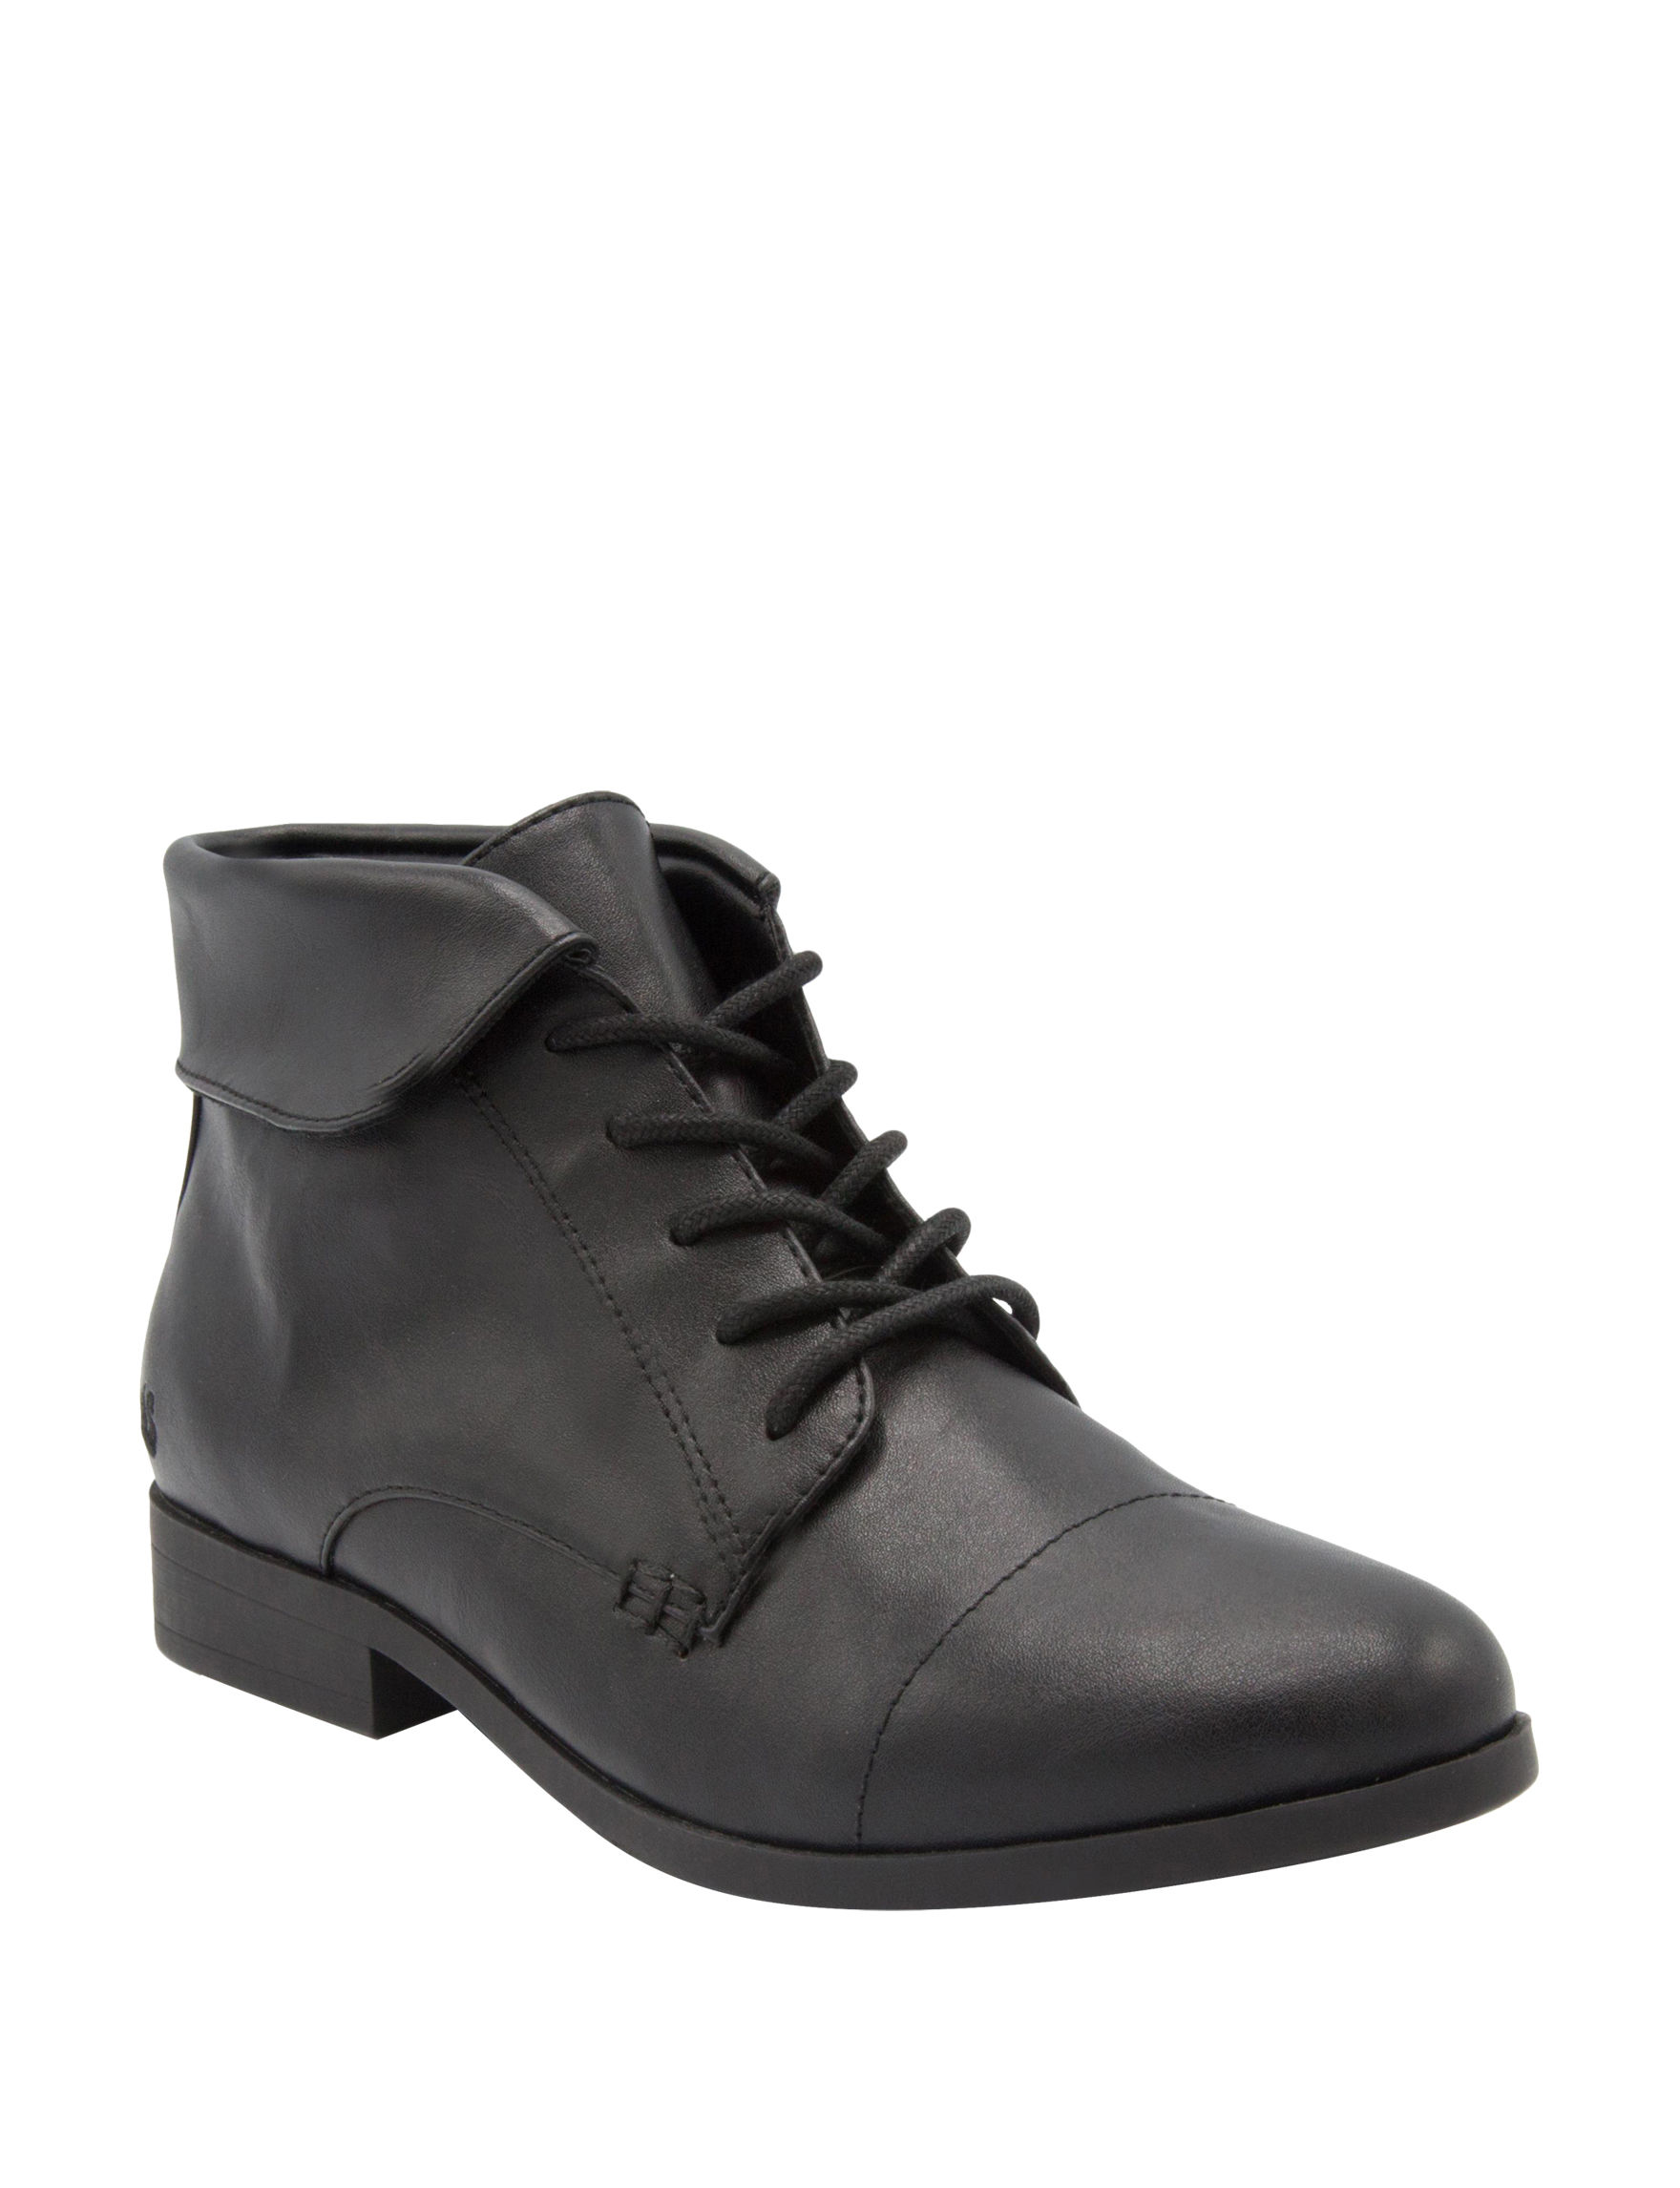 Gloria Vanderbilt Black Ankle Boots & Booties